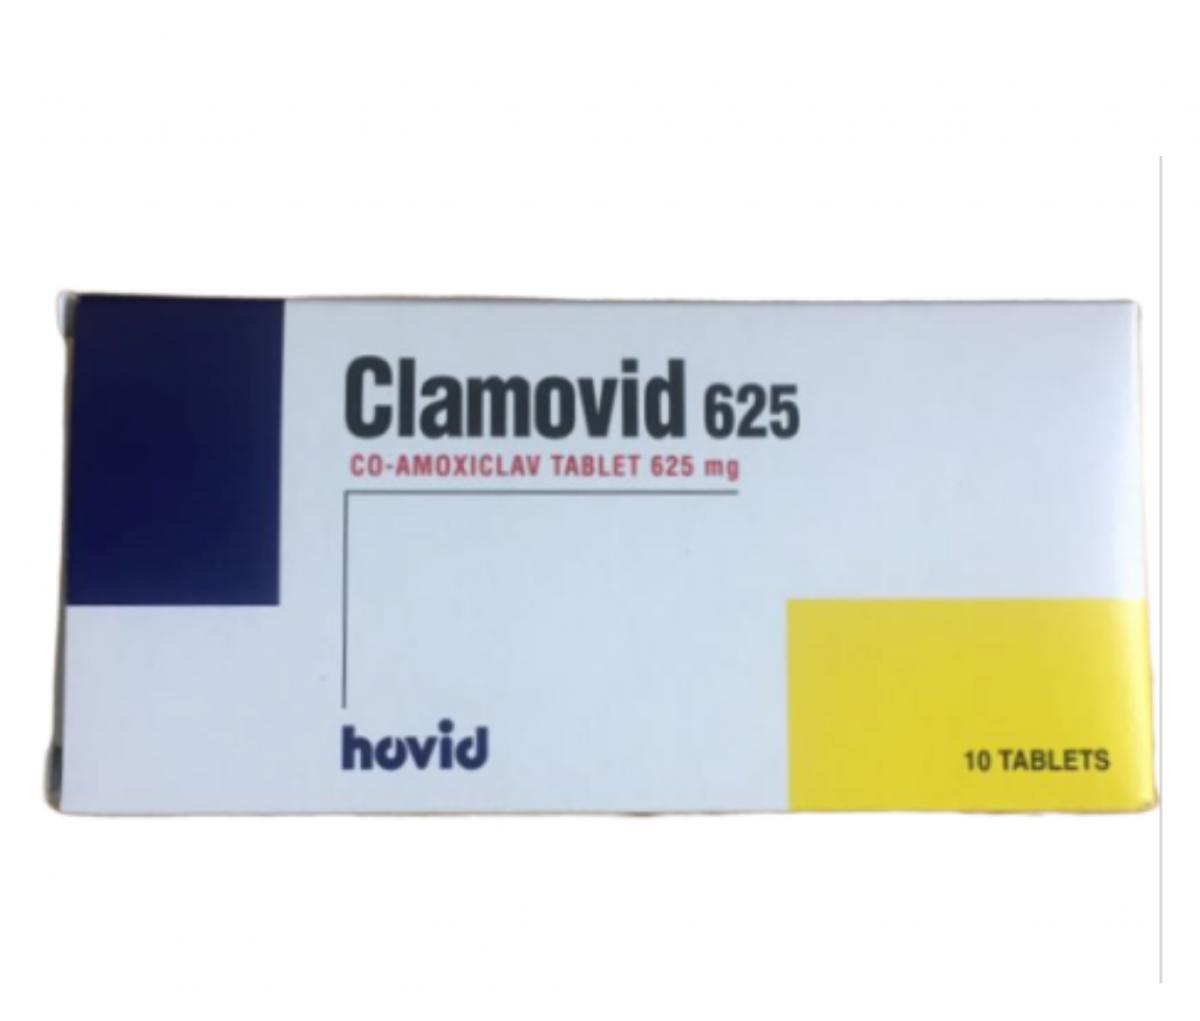 Clamovid 625mg Tablet